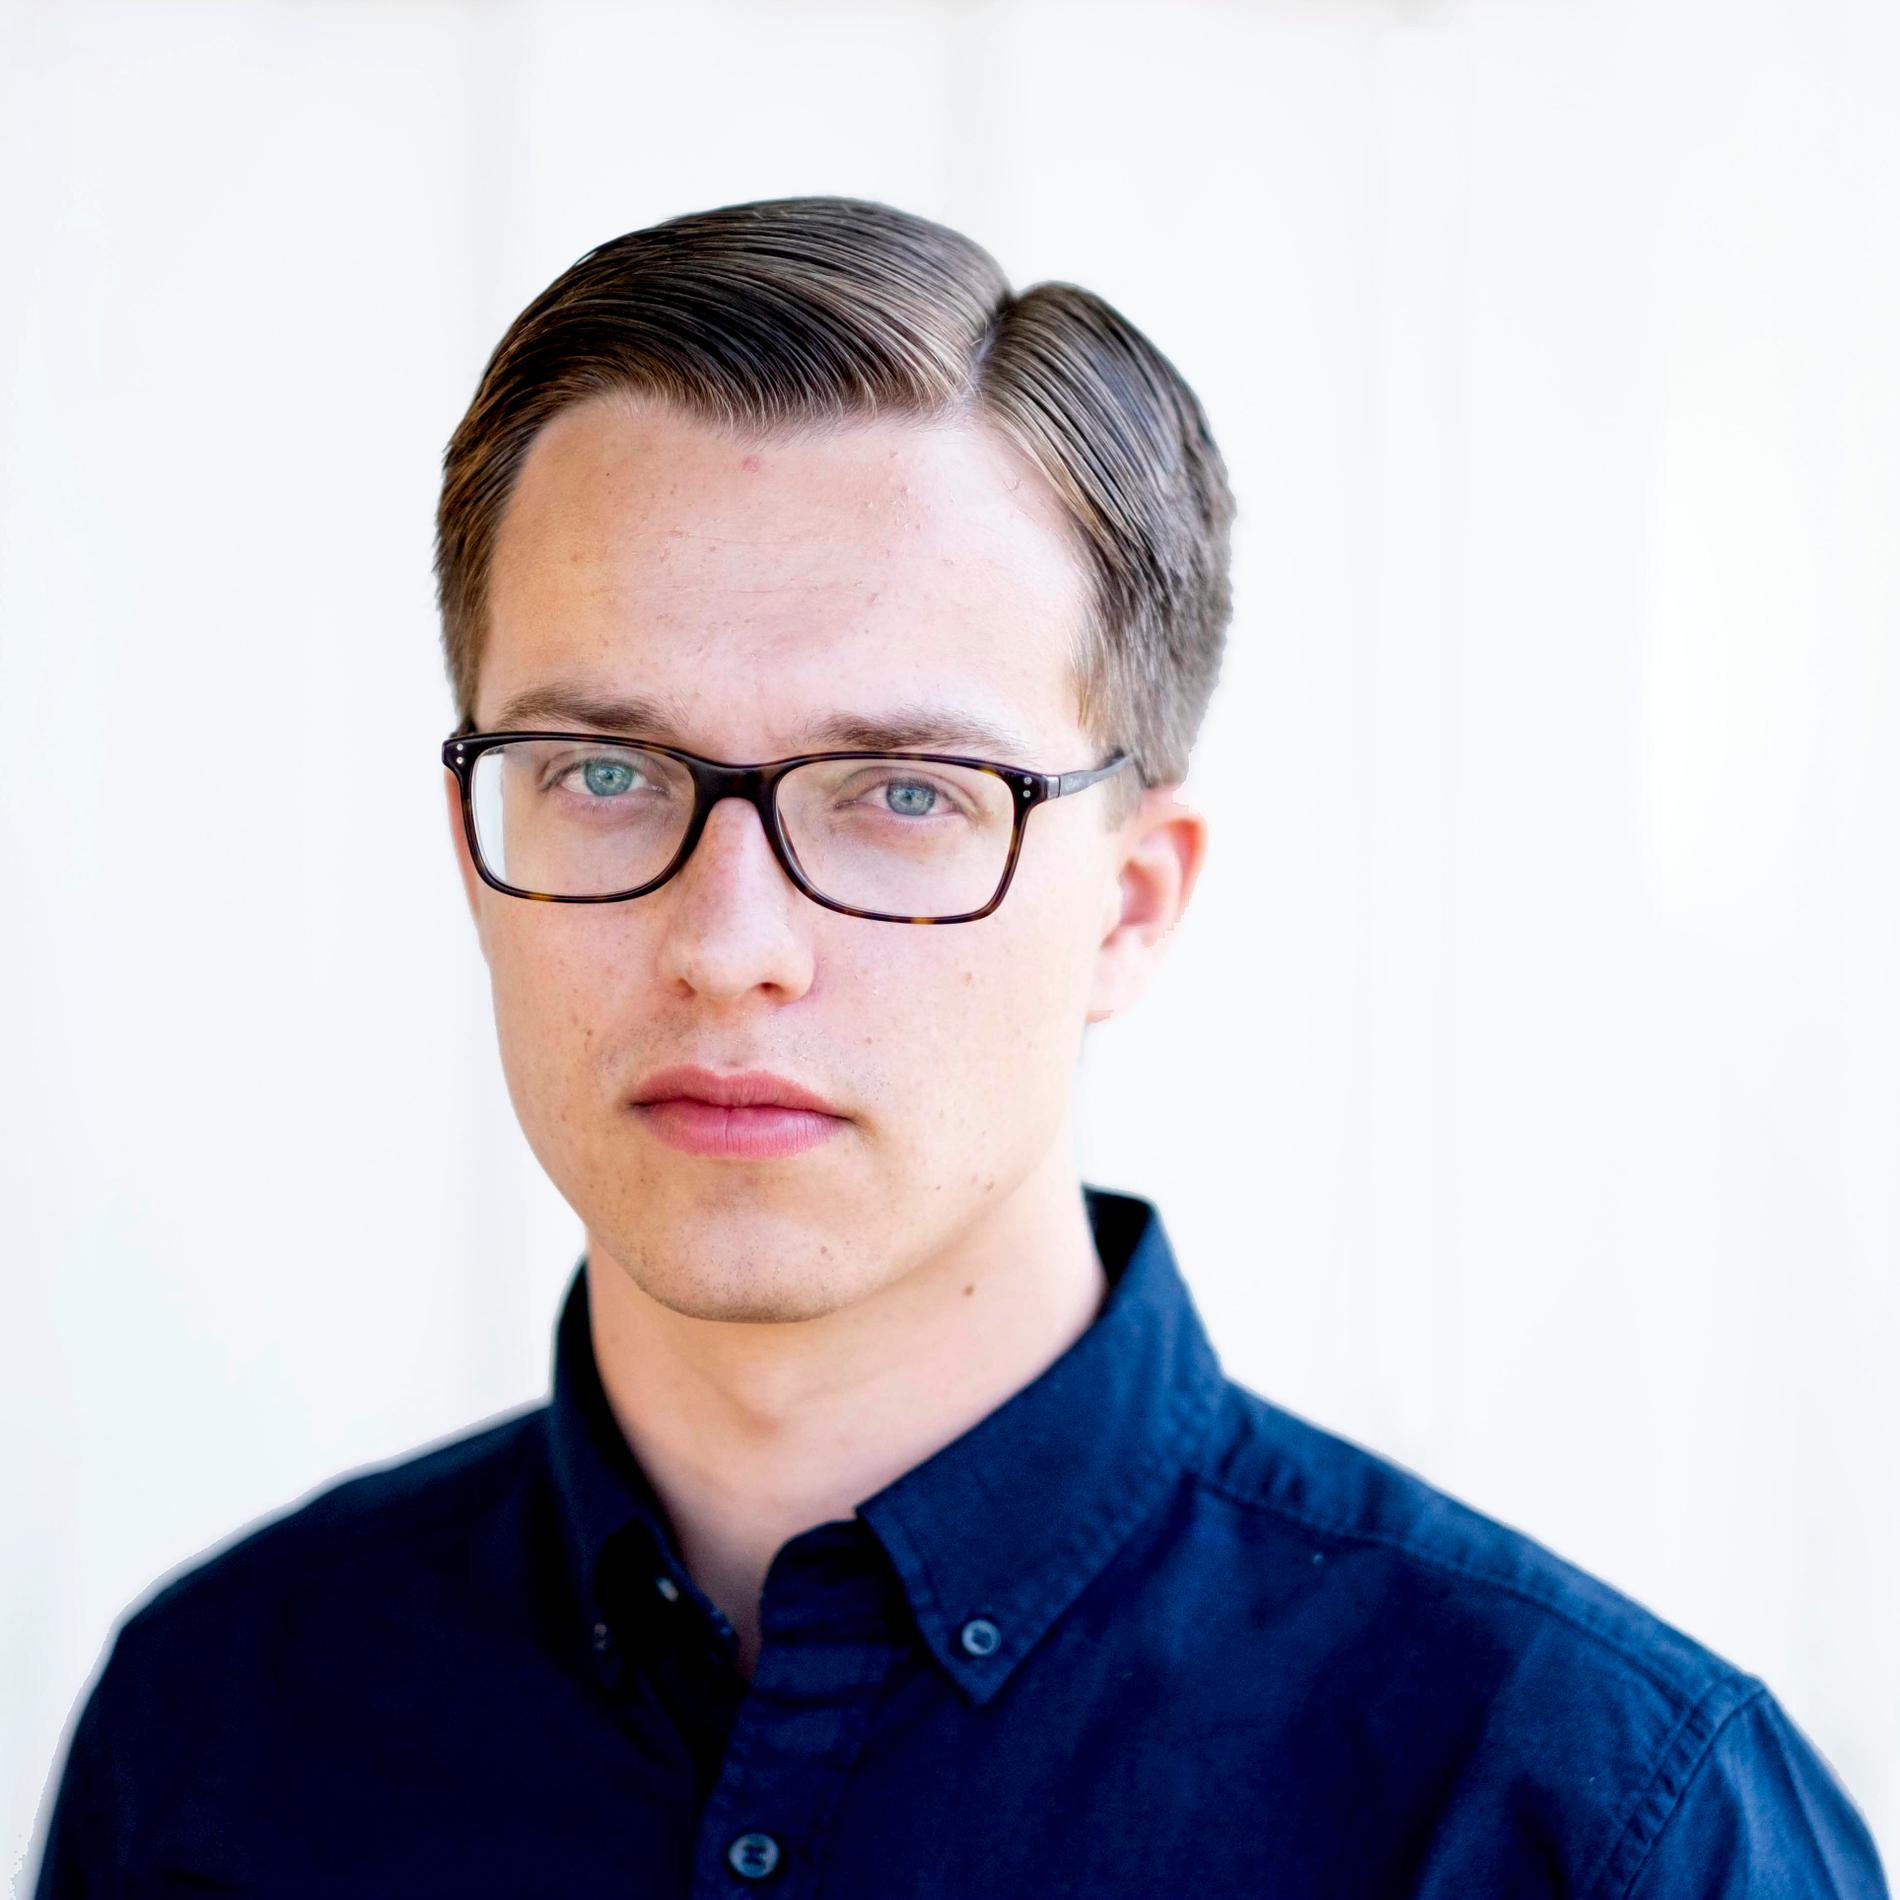 Marius Wiig Holmen